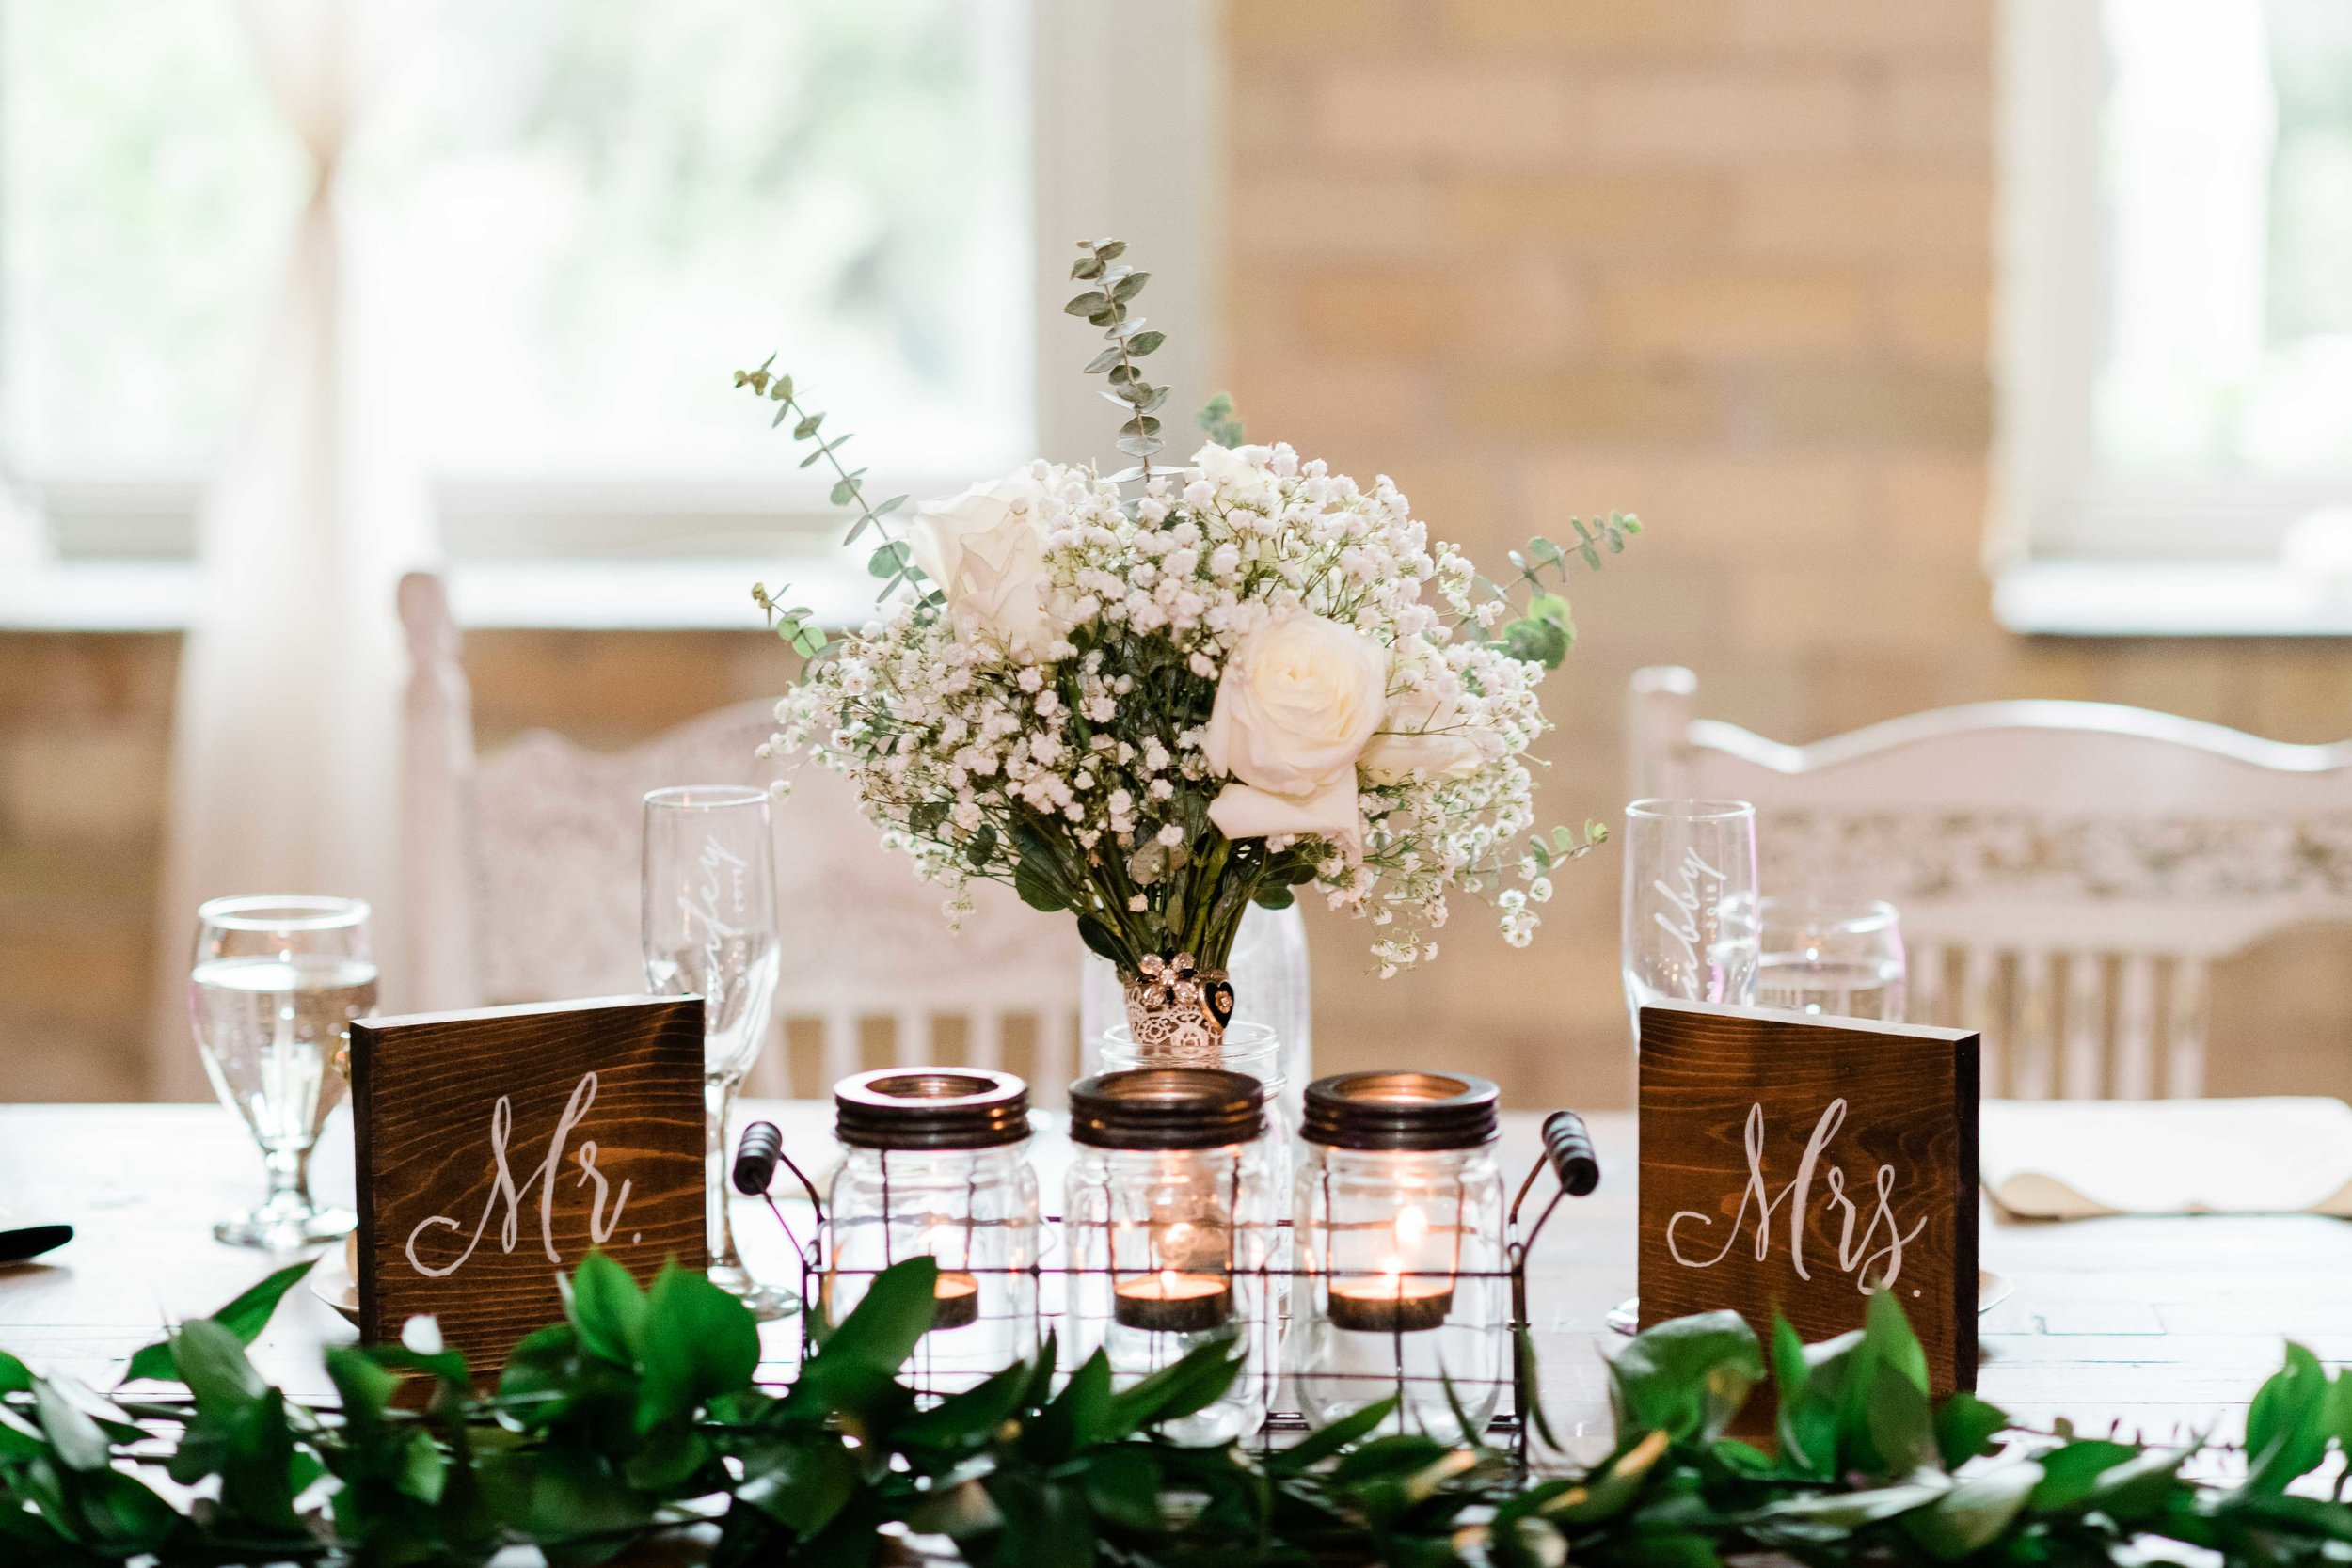 Sweetheart table decor